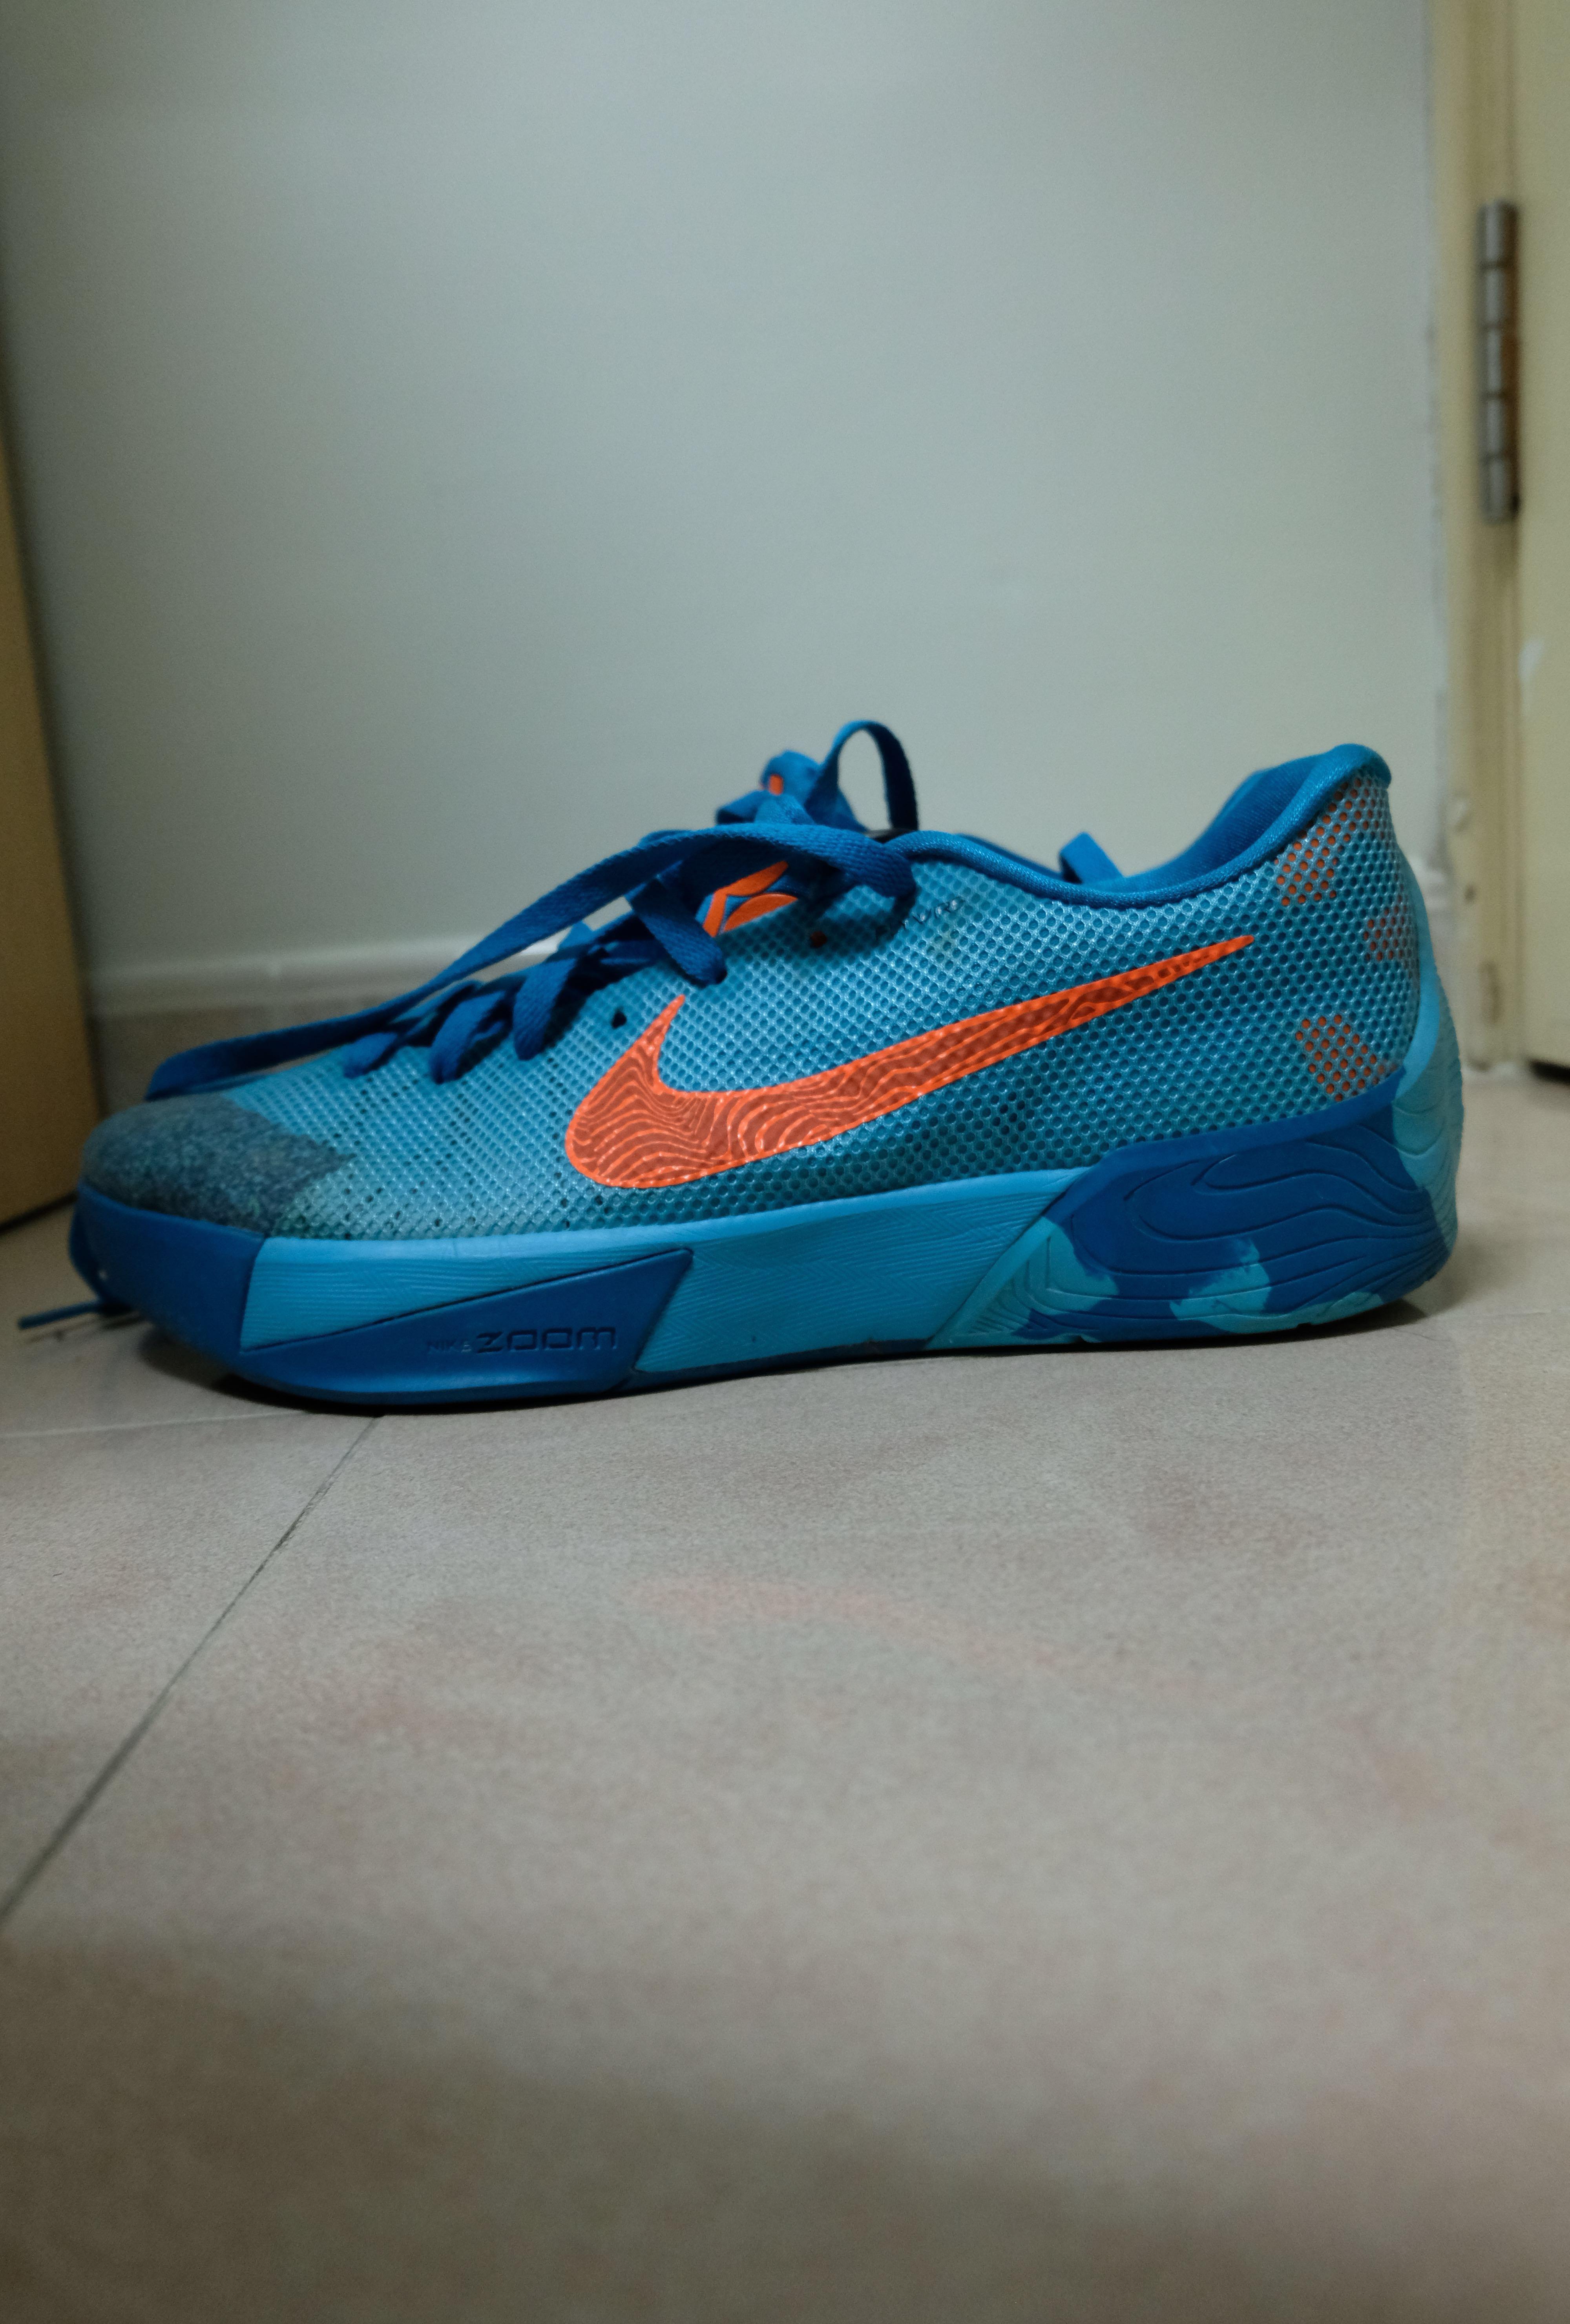 sports shoes 37e11 4cbd6 Nike KD Trey 5 II Clearwater total Orange Basketball Shoes 籃球鞋, Men s  Fashion, Men s Footwear on Carousell